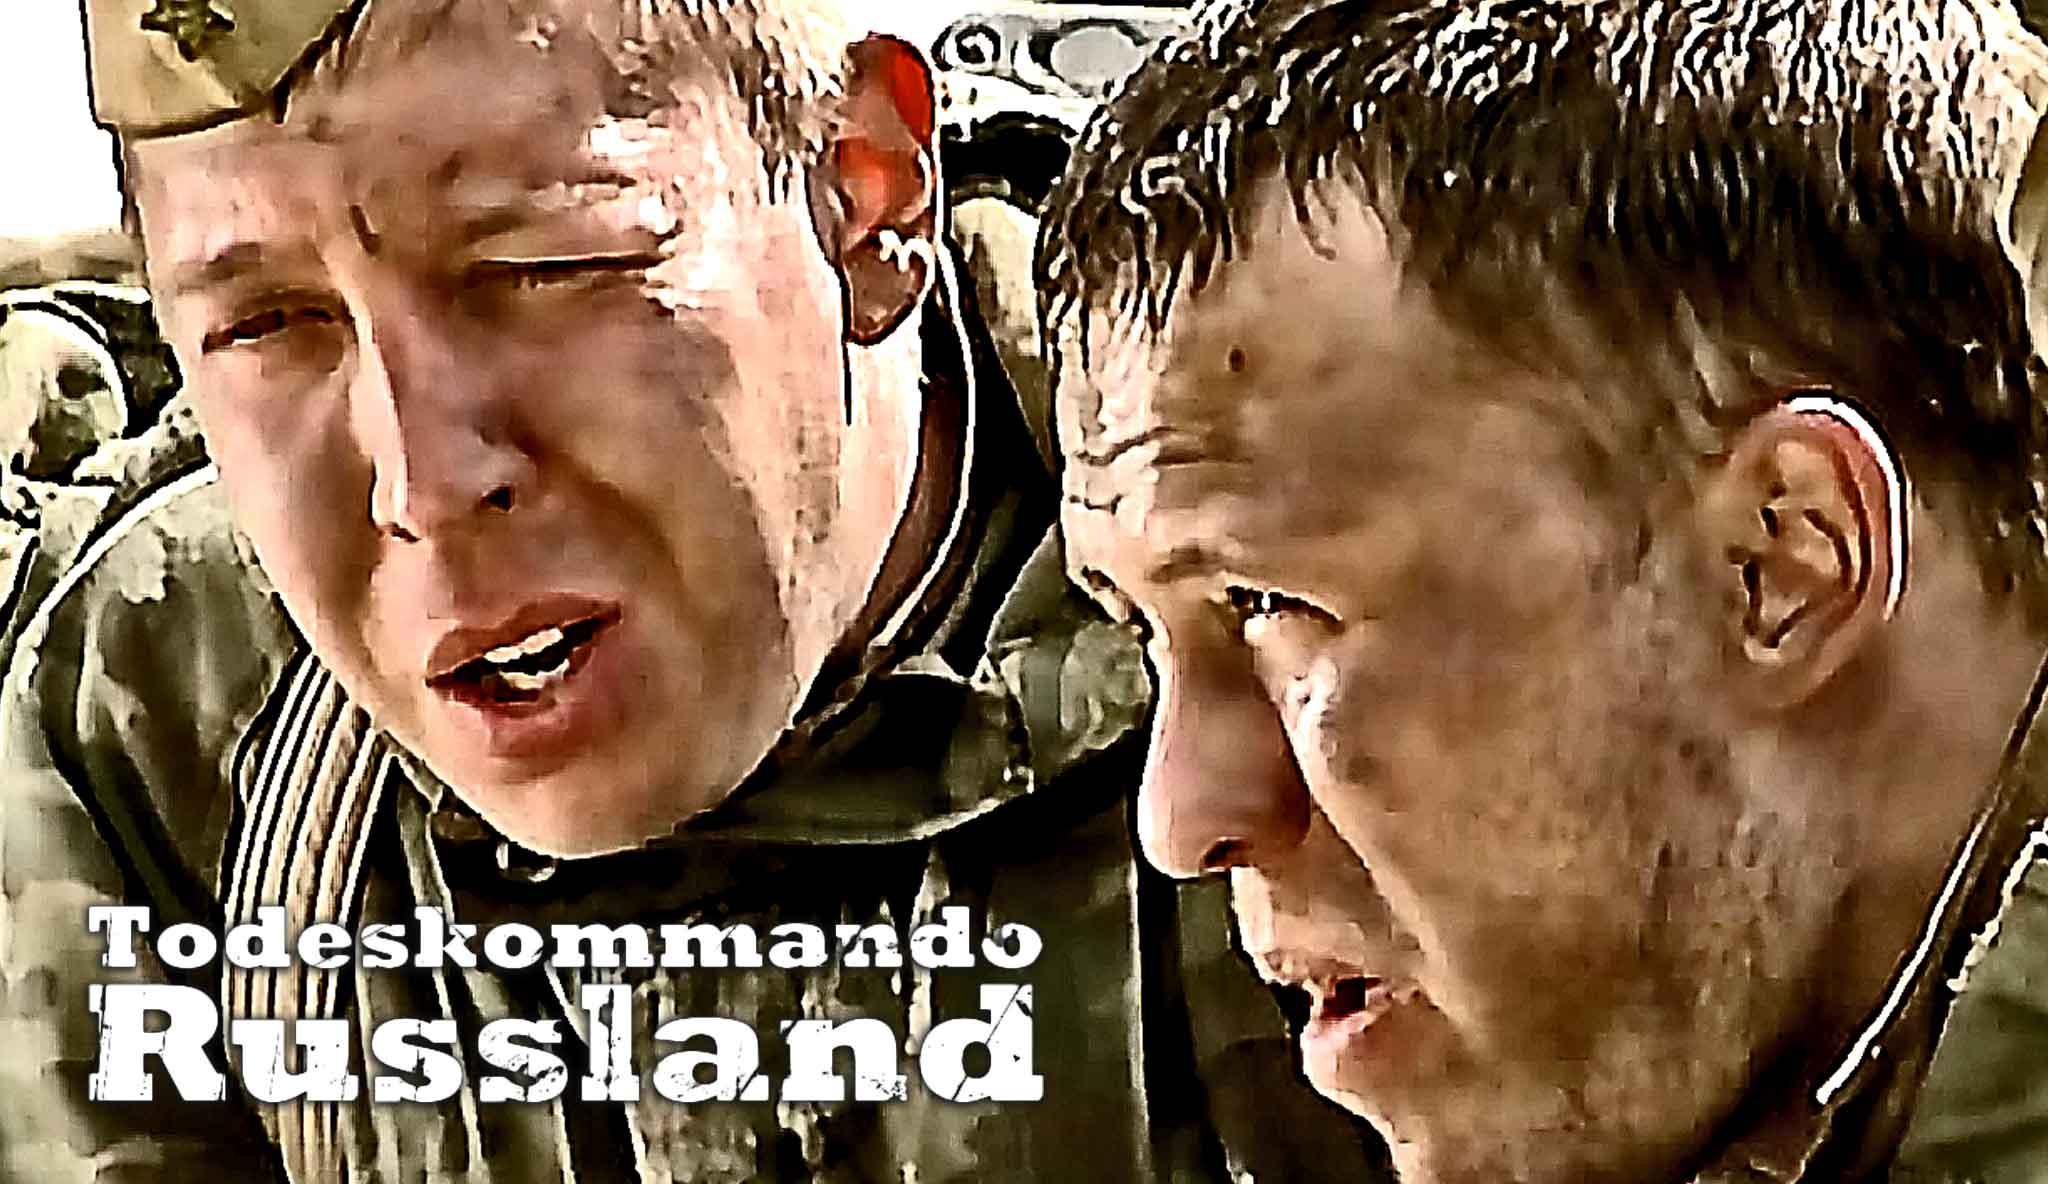 todeskommando-russland-1\header.jpg